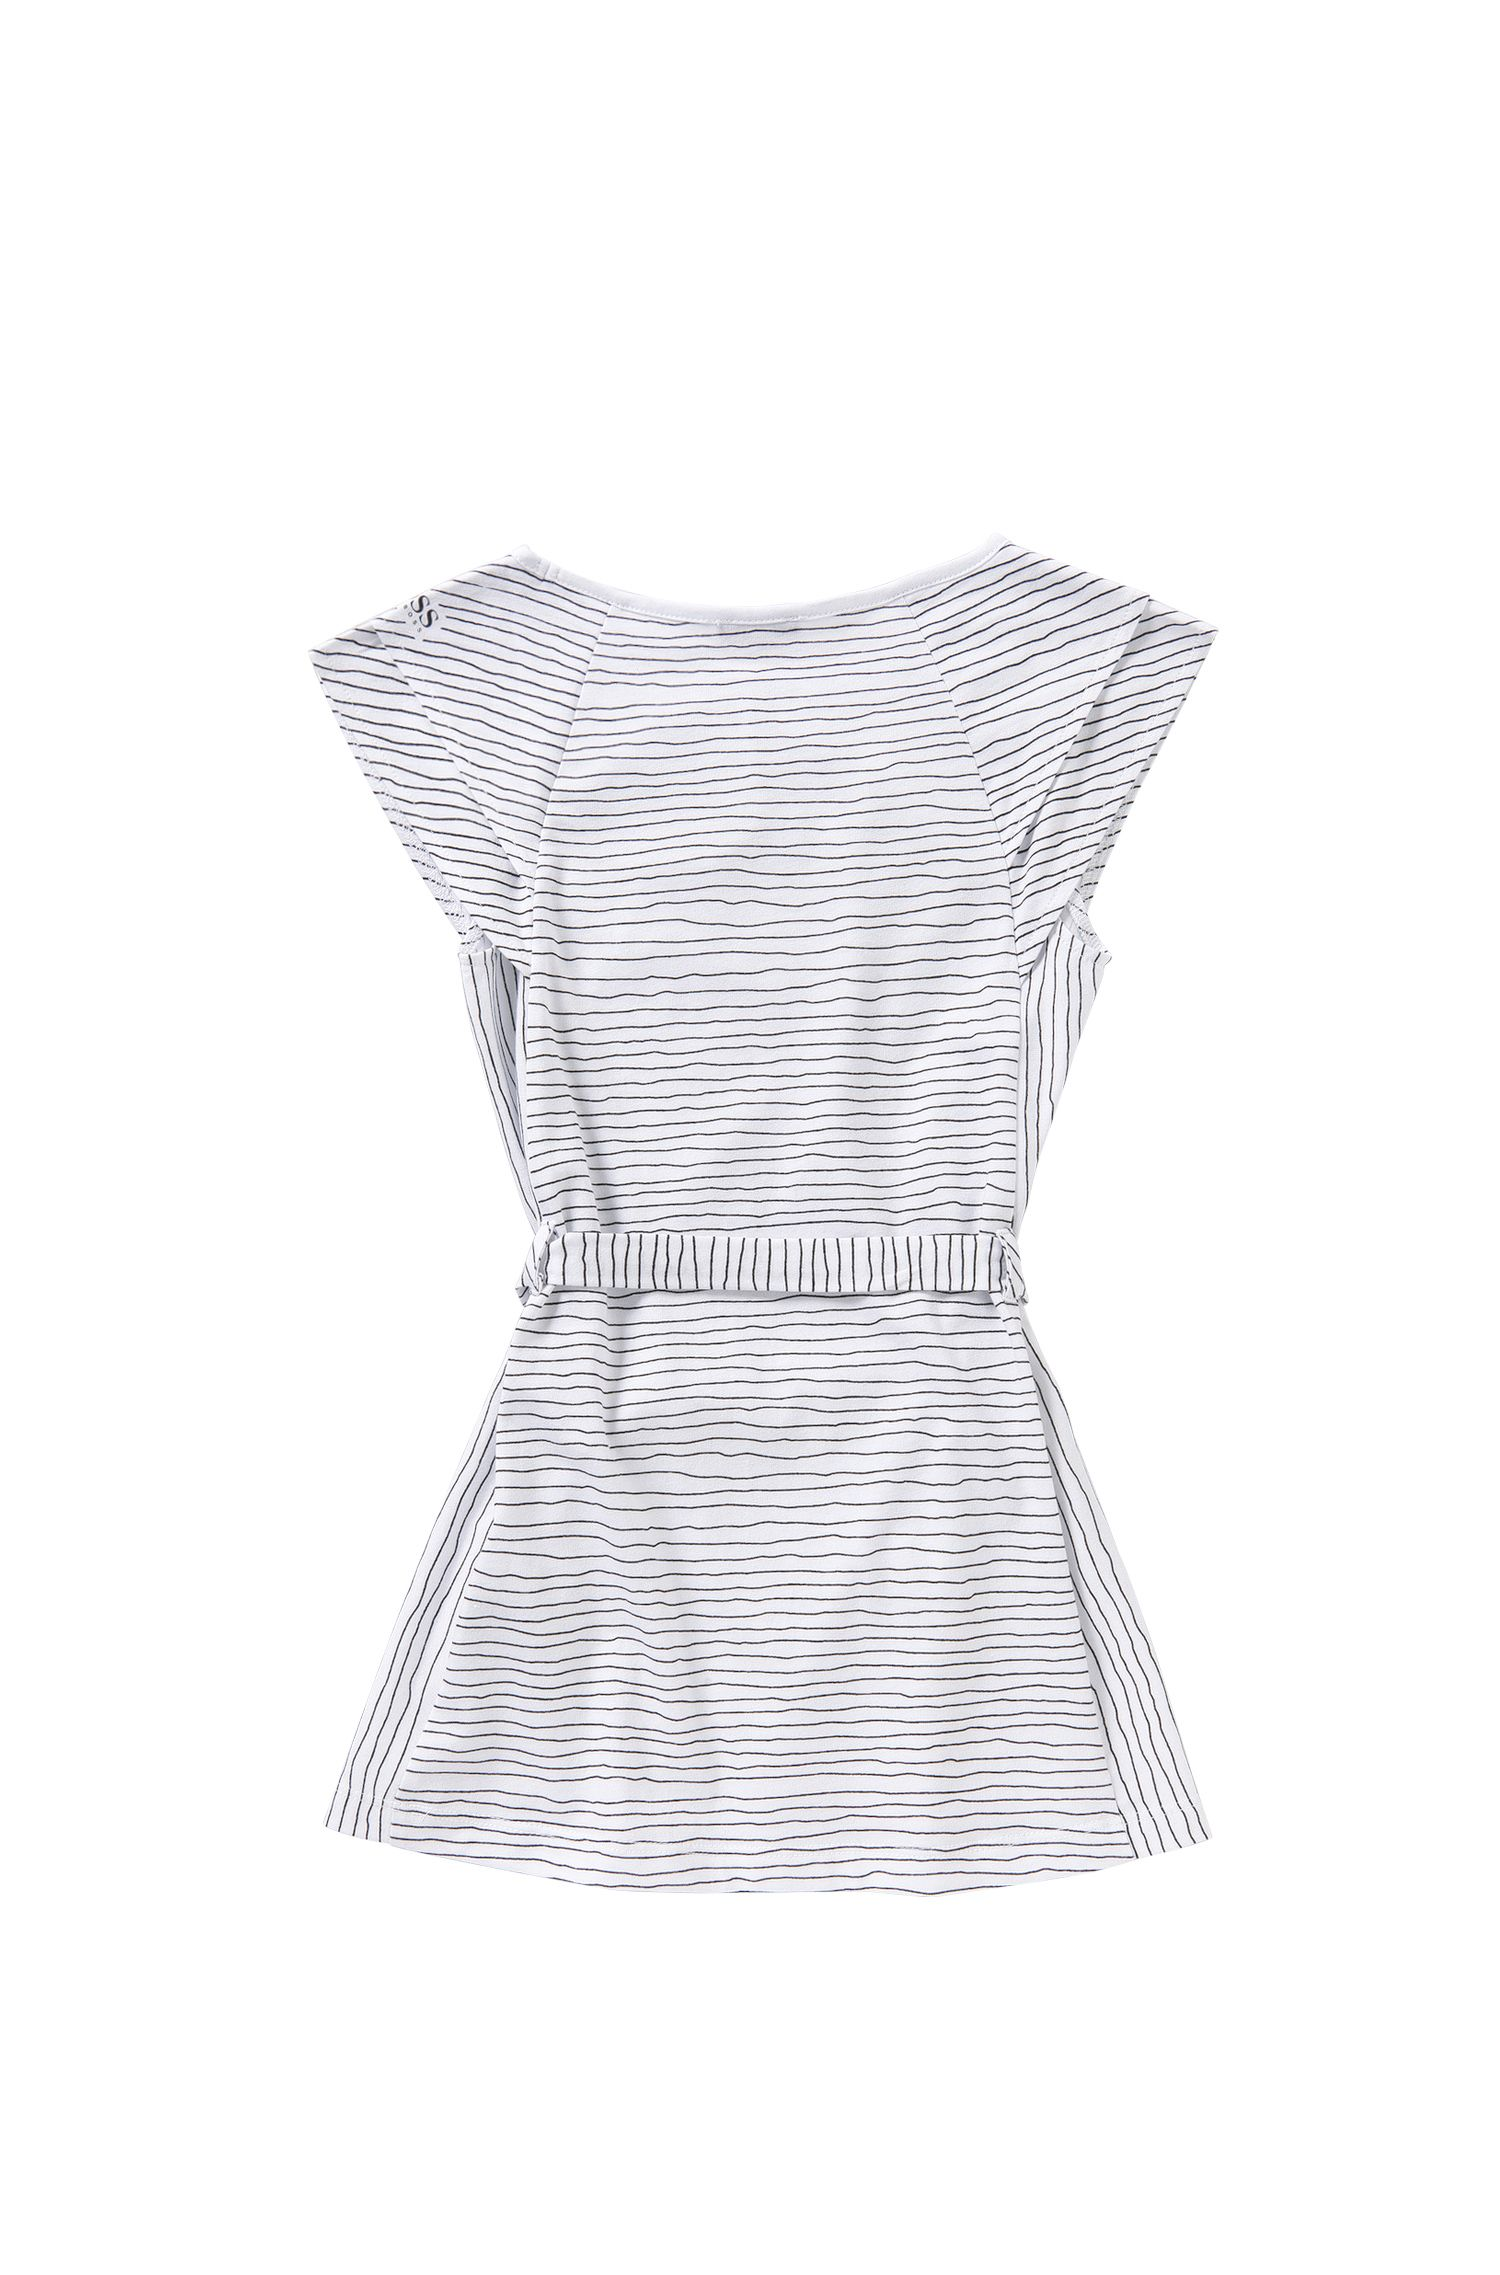 'J12148' | Girls Modal Jersey Belted Striped Dress